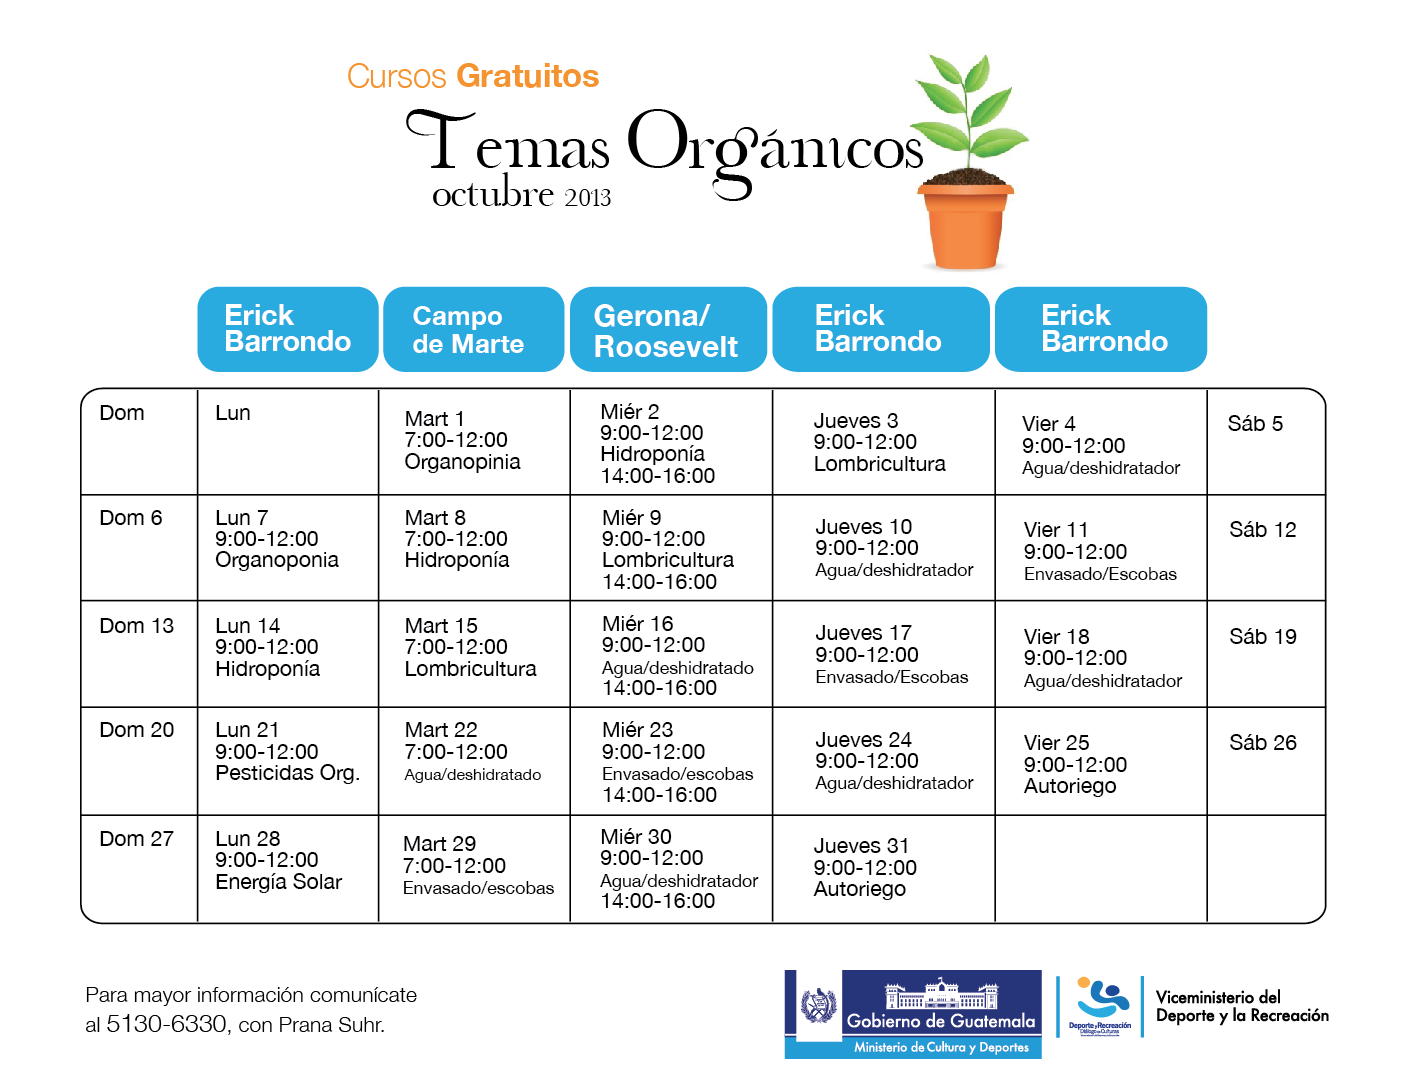 organicos Oct